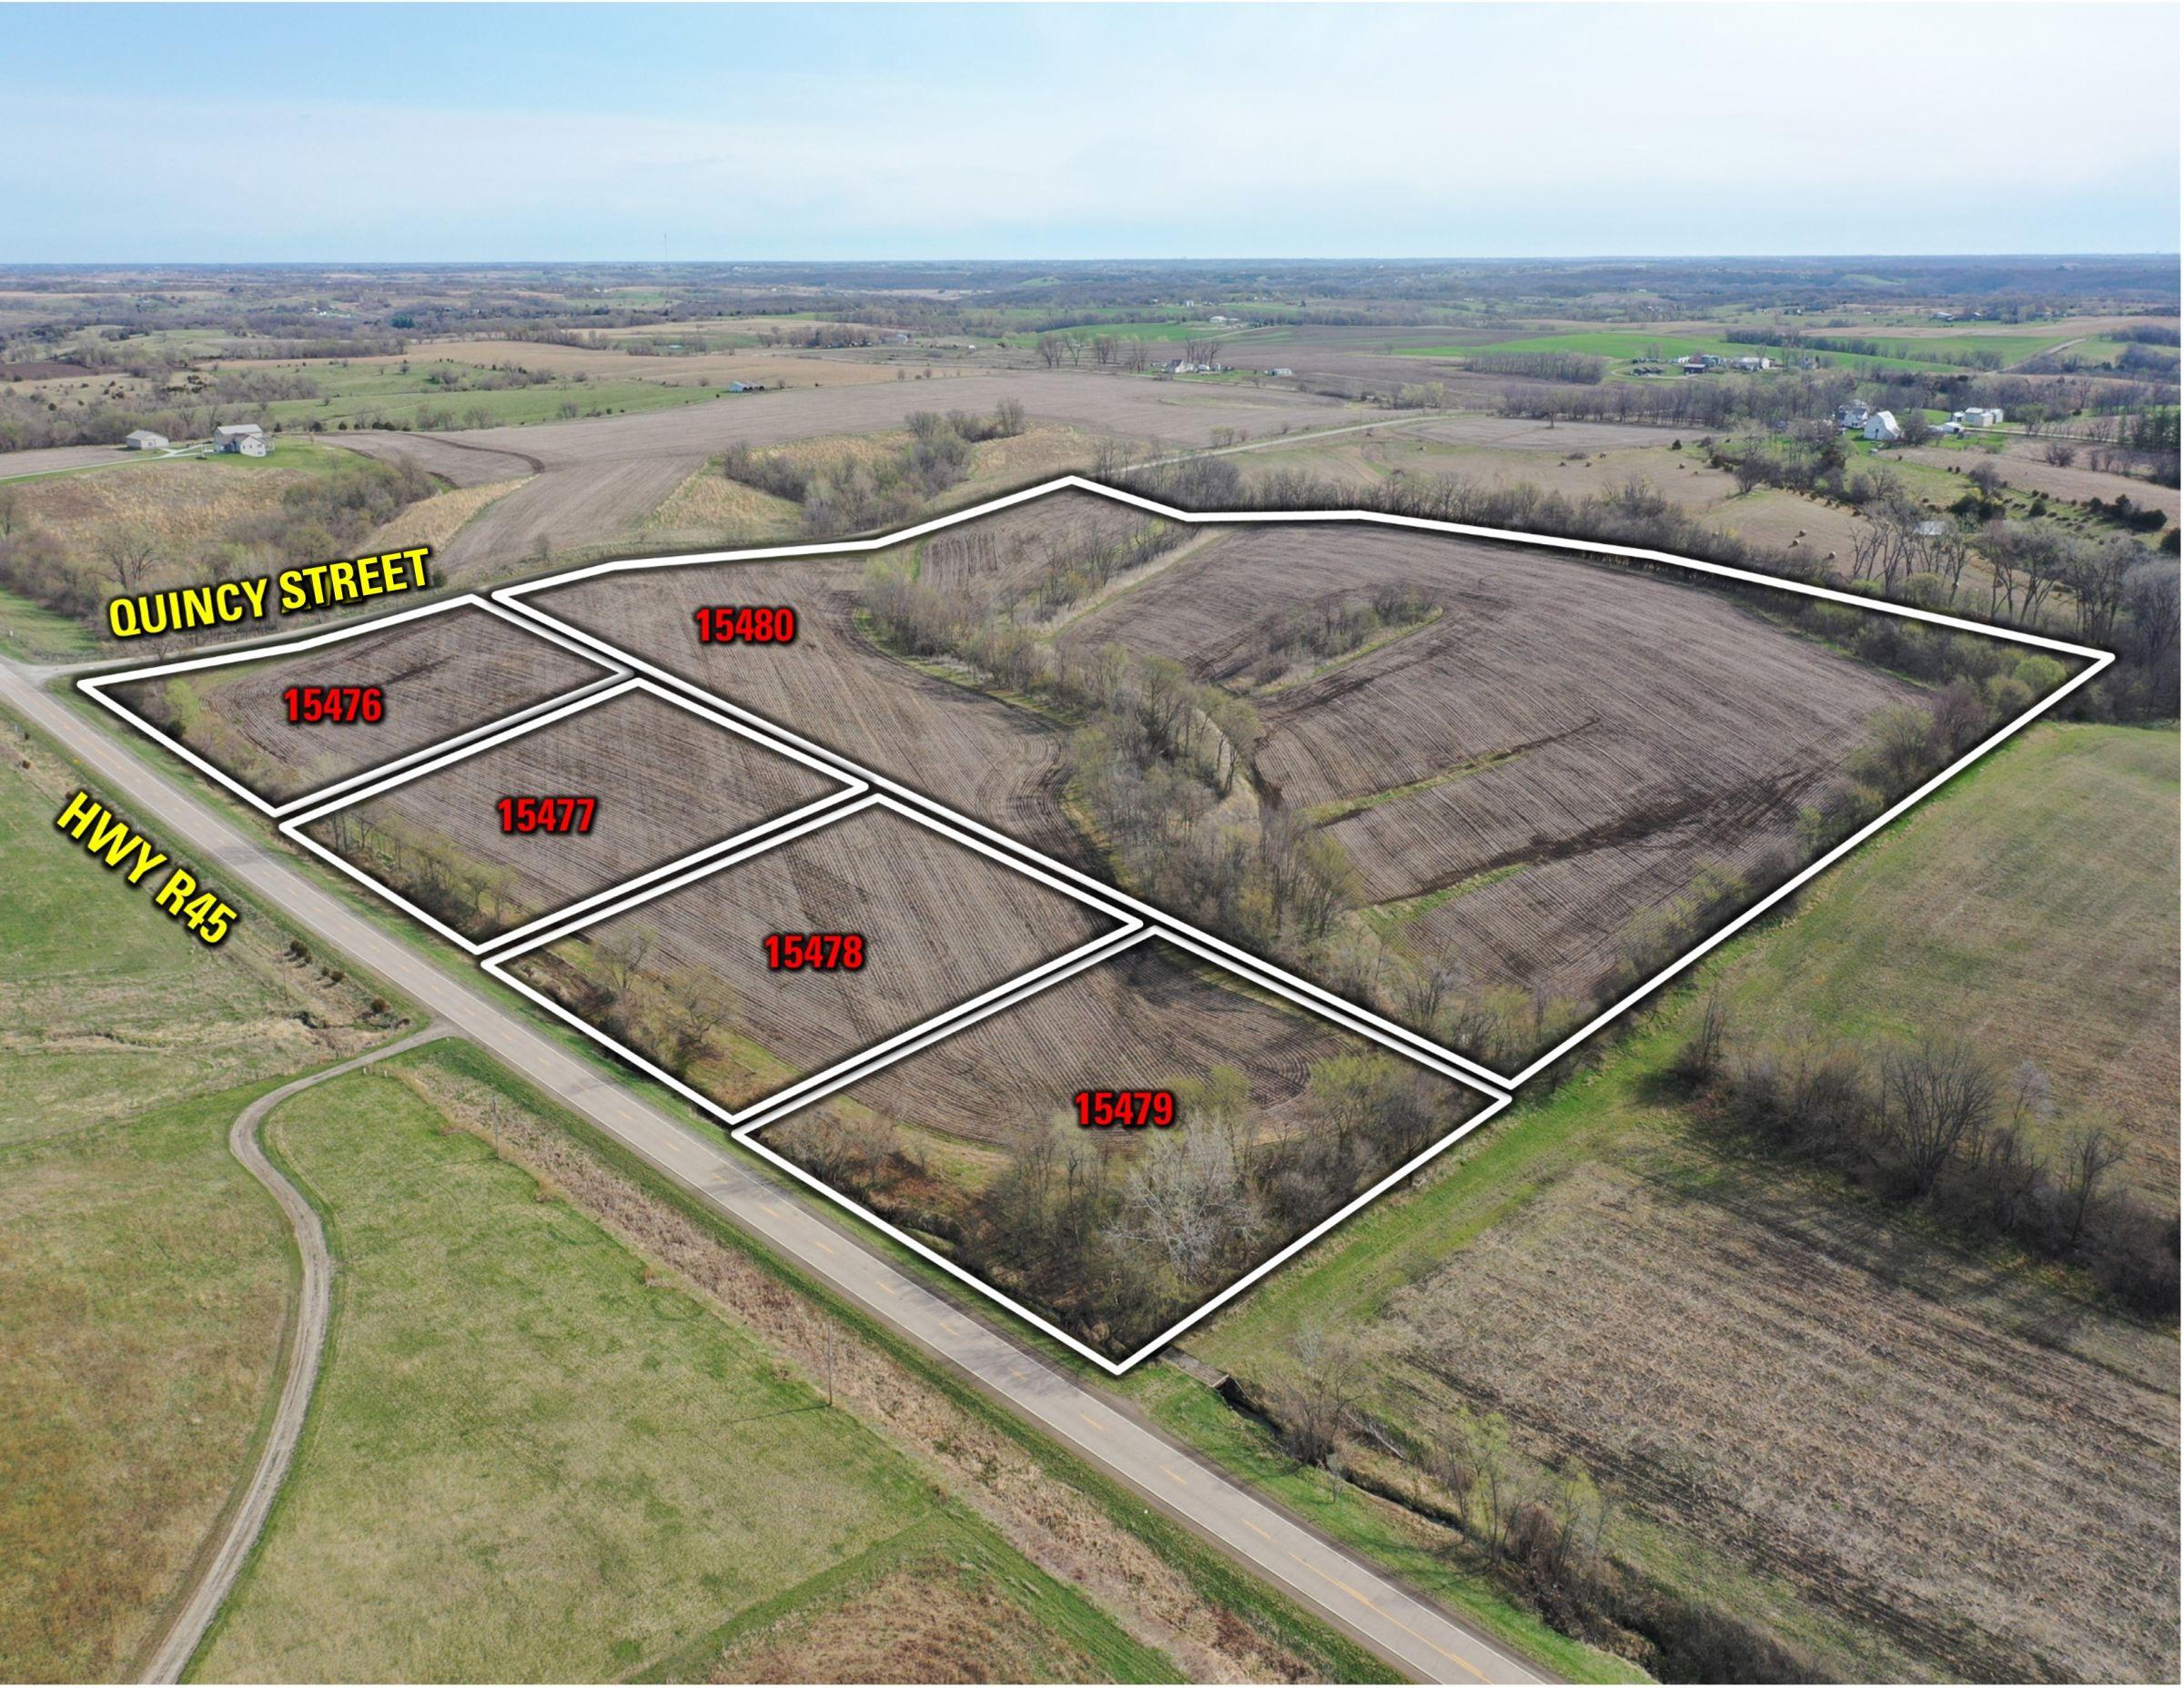 land-warren-county-iowa-3-acres-listing-number-15479-1-2021-04-23-143703.jpg